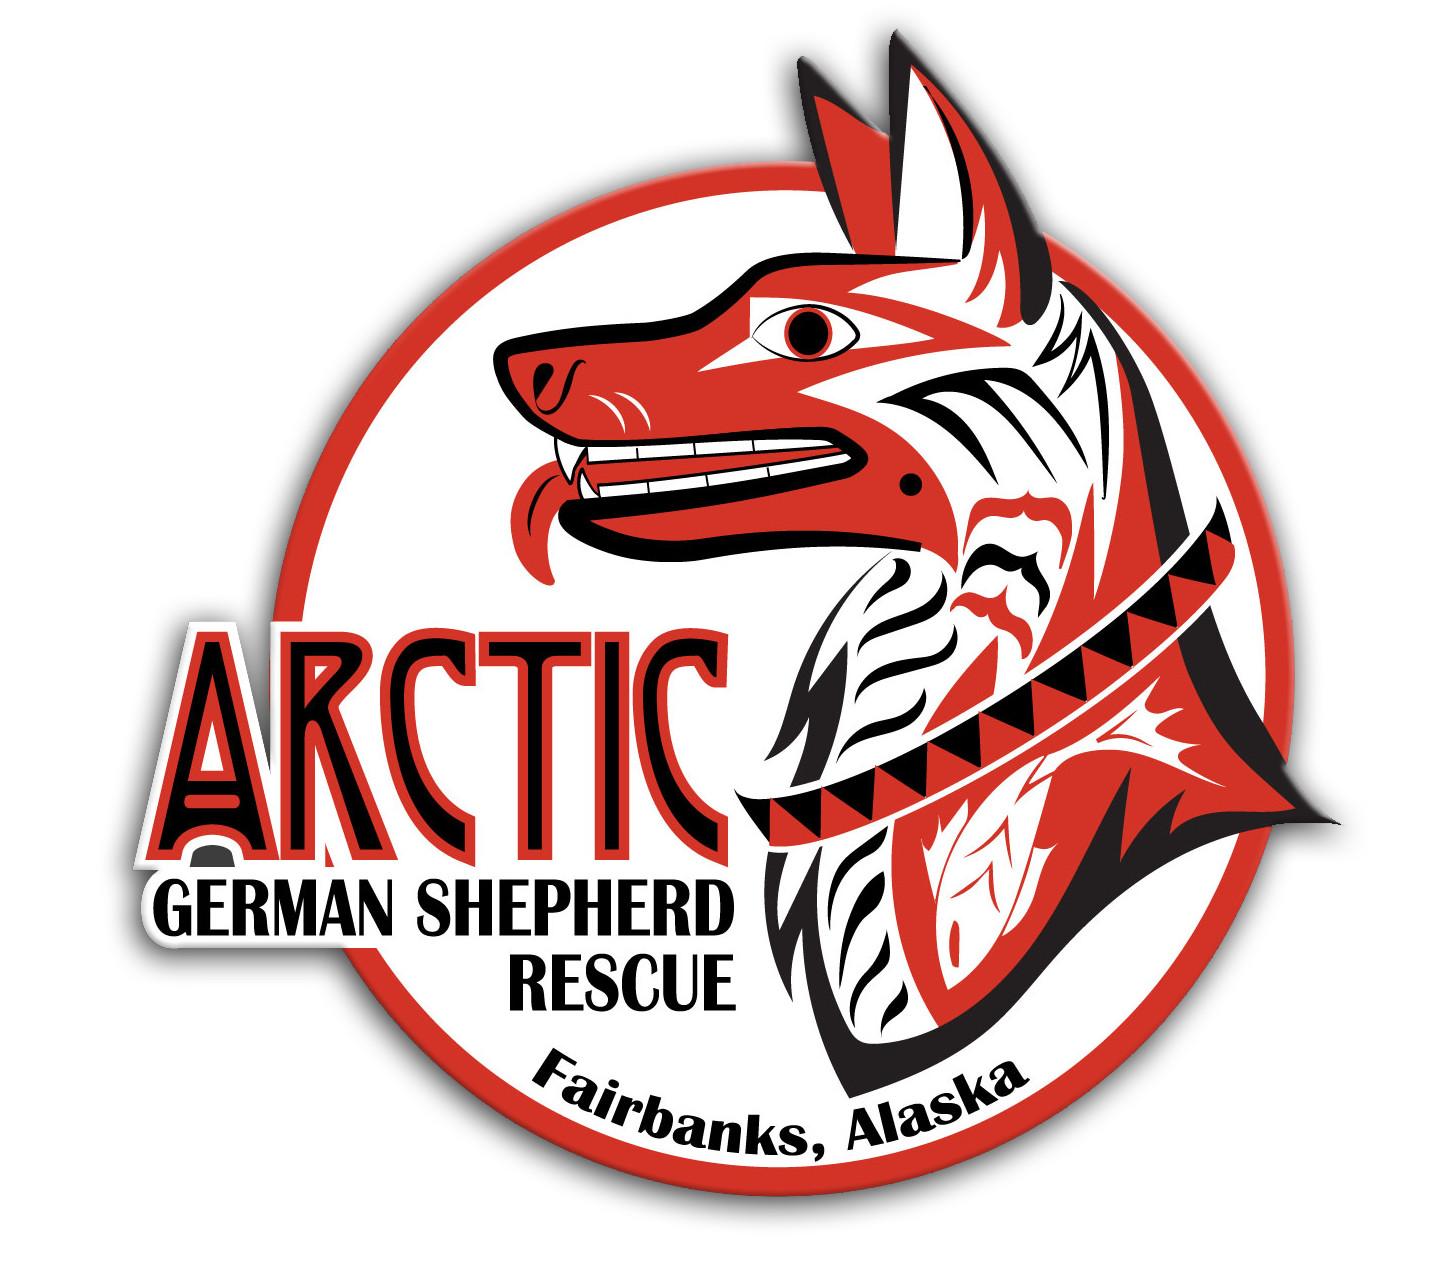 Arctic German Shepherd Rescue